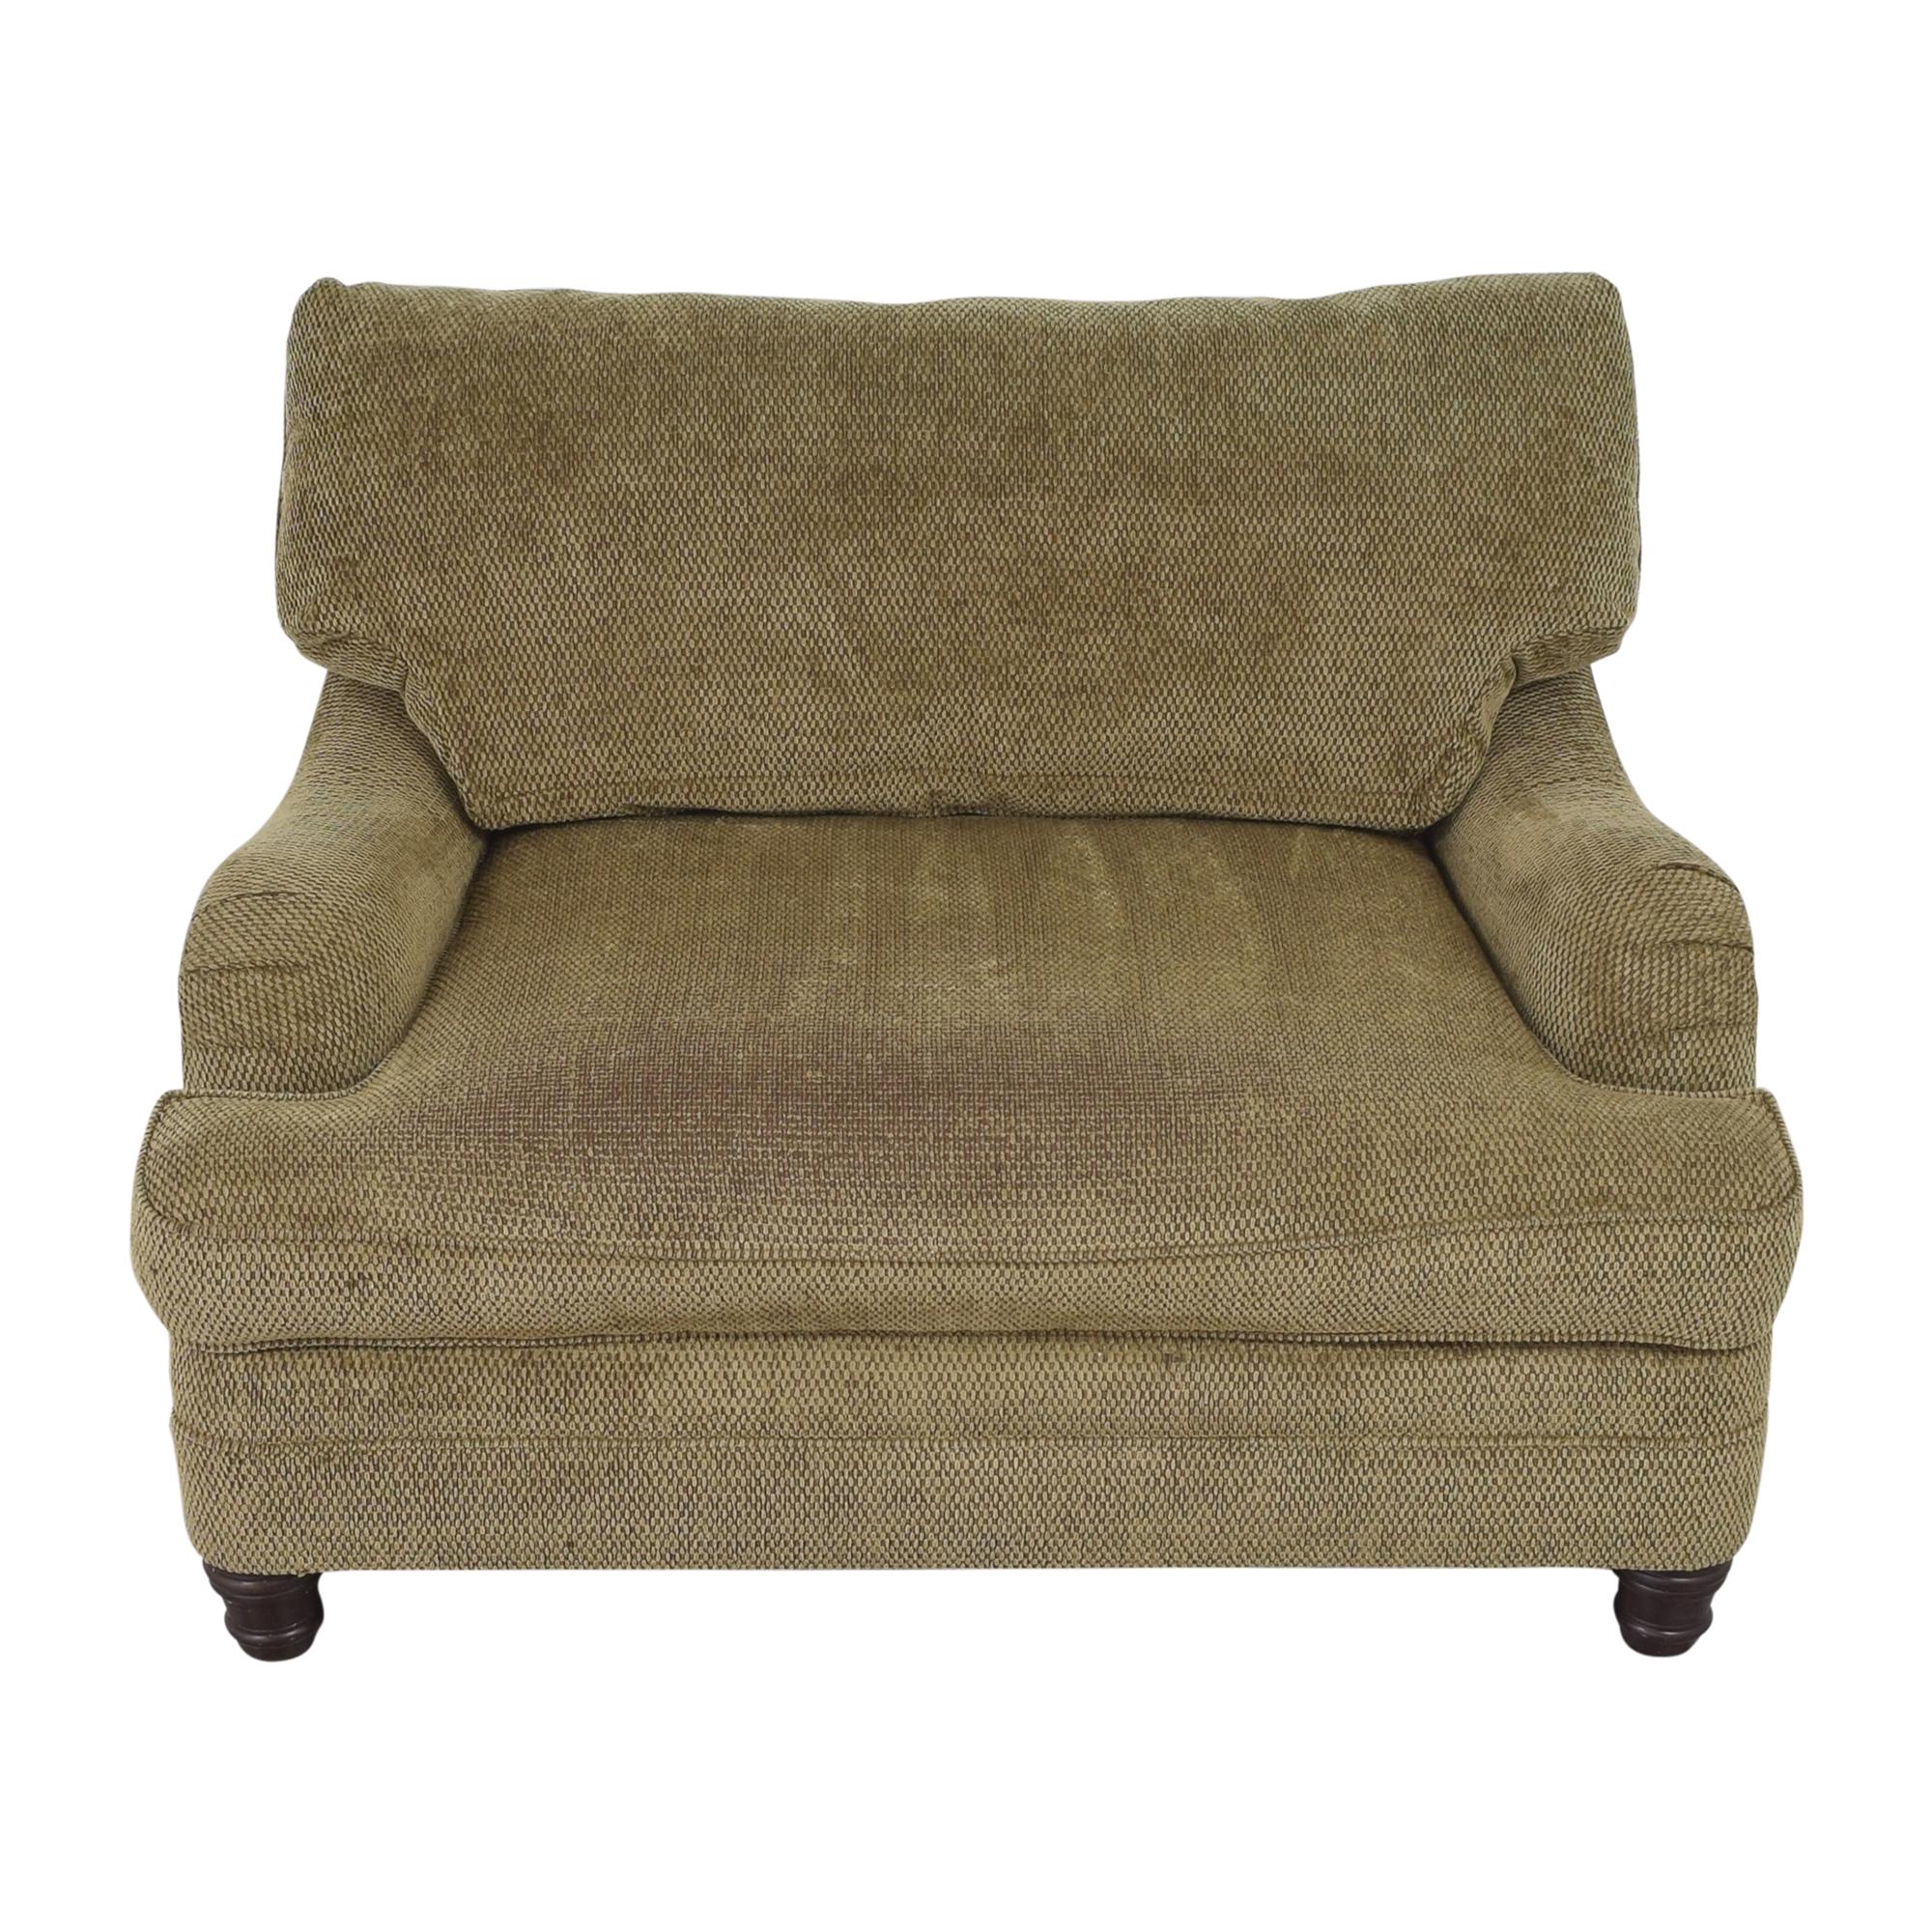 shop Bernhardt English Roll Arm Chair and a Half Bernhardt Chairs